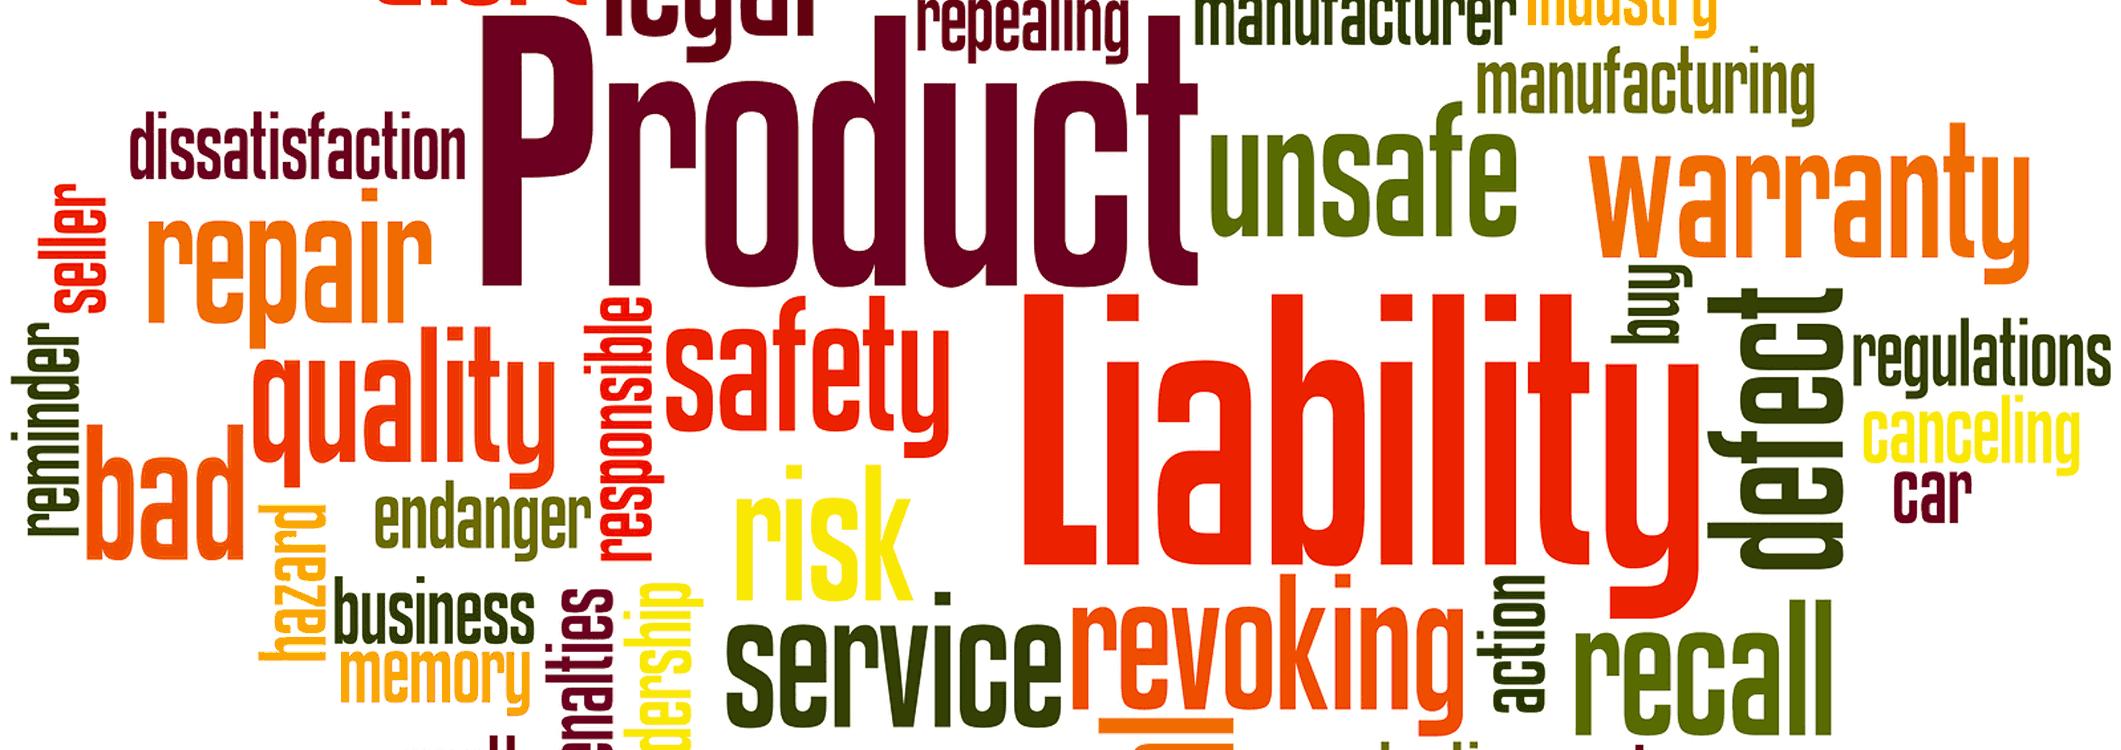 defects liability mechanical recalls